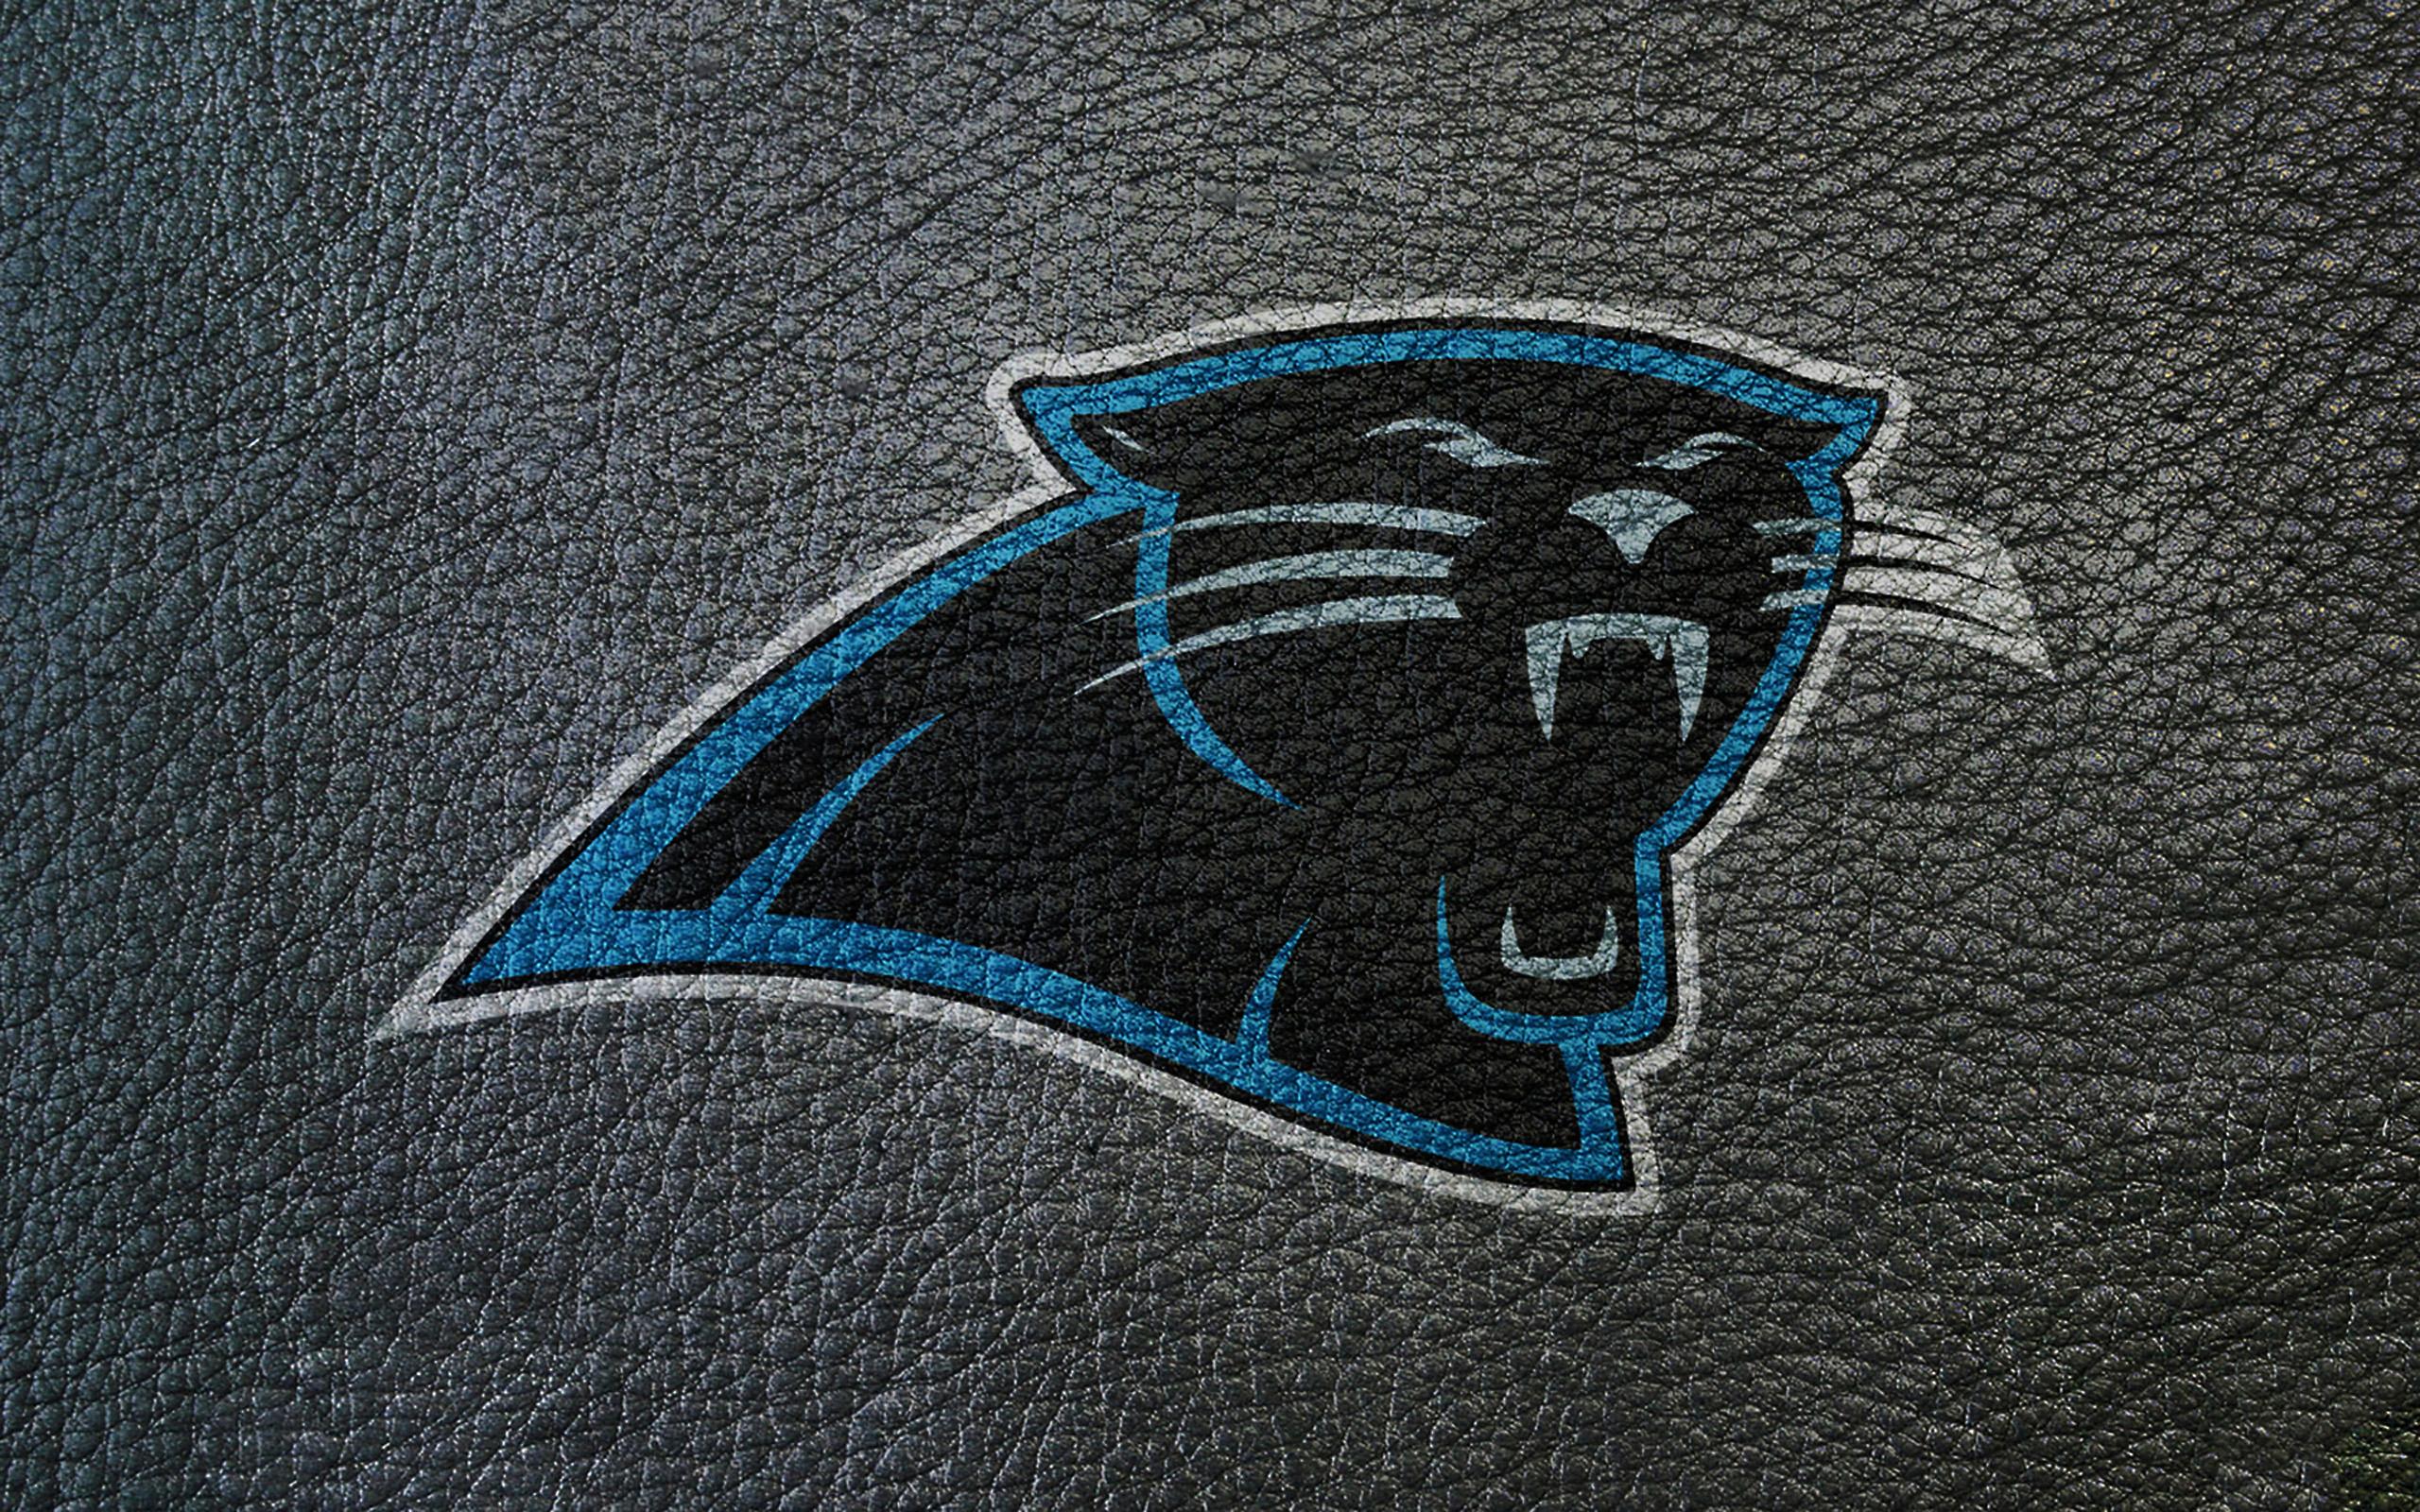 Carolina Panthers Wallpaper Leather Imagejpg 2560x1600